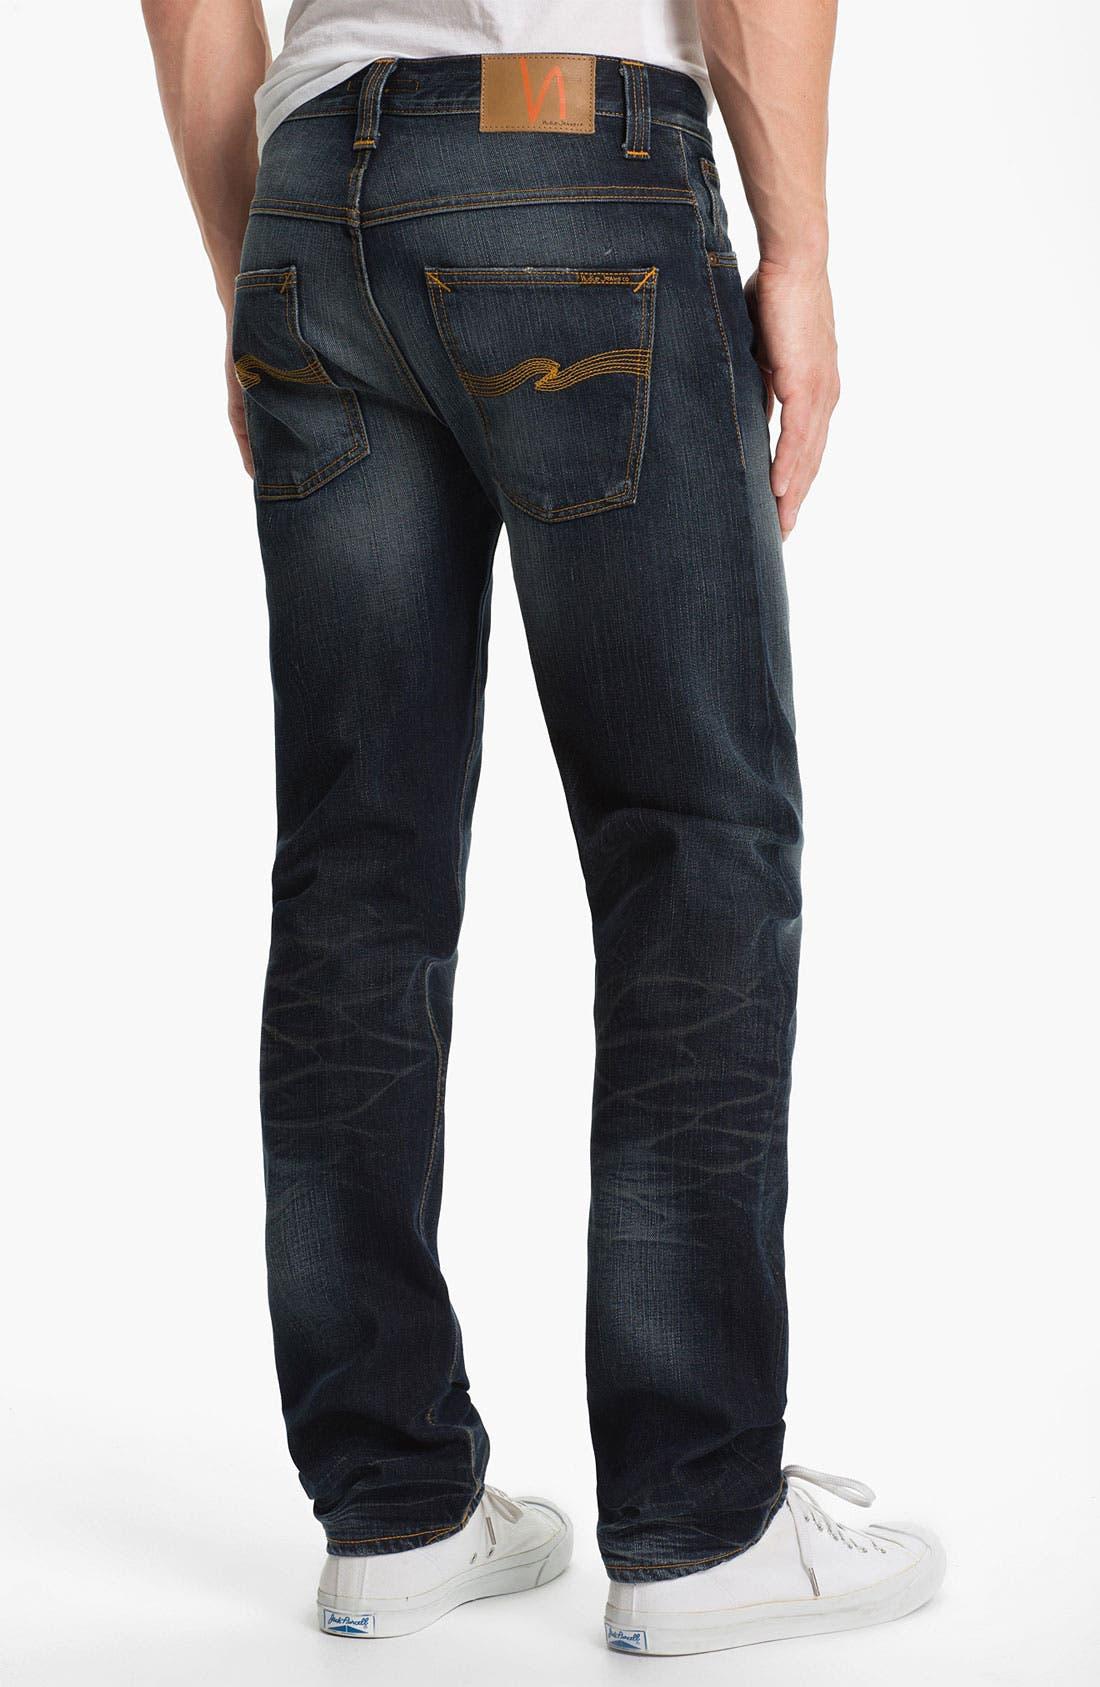 Alternate Image 1 Selected - Nudie 'Hank Rey' Straight Leg Jeans (Organic Indigo Depth)